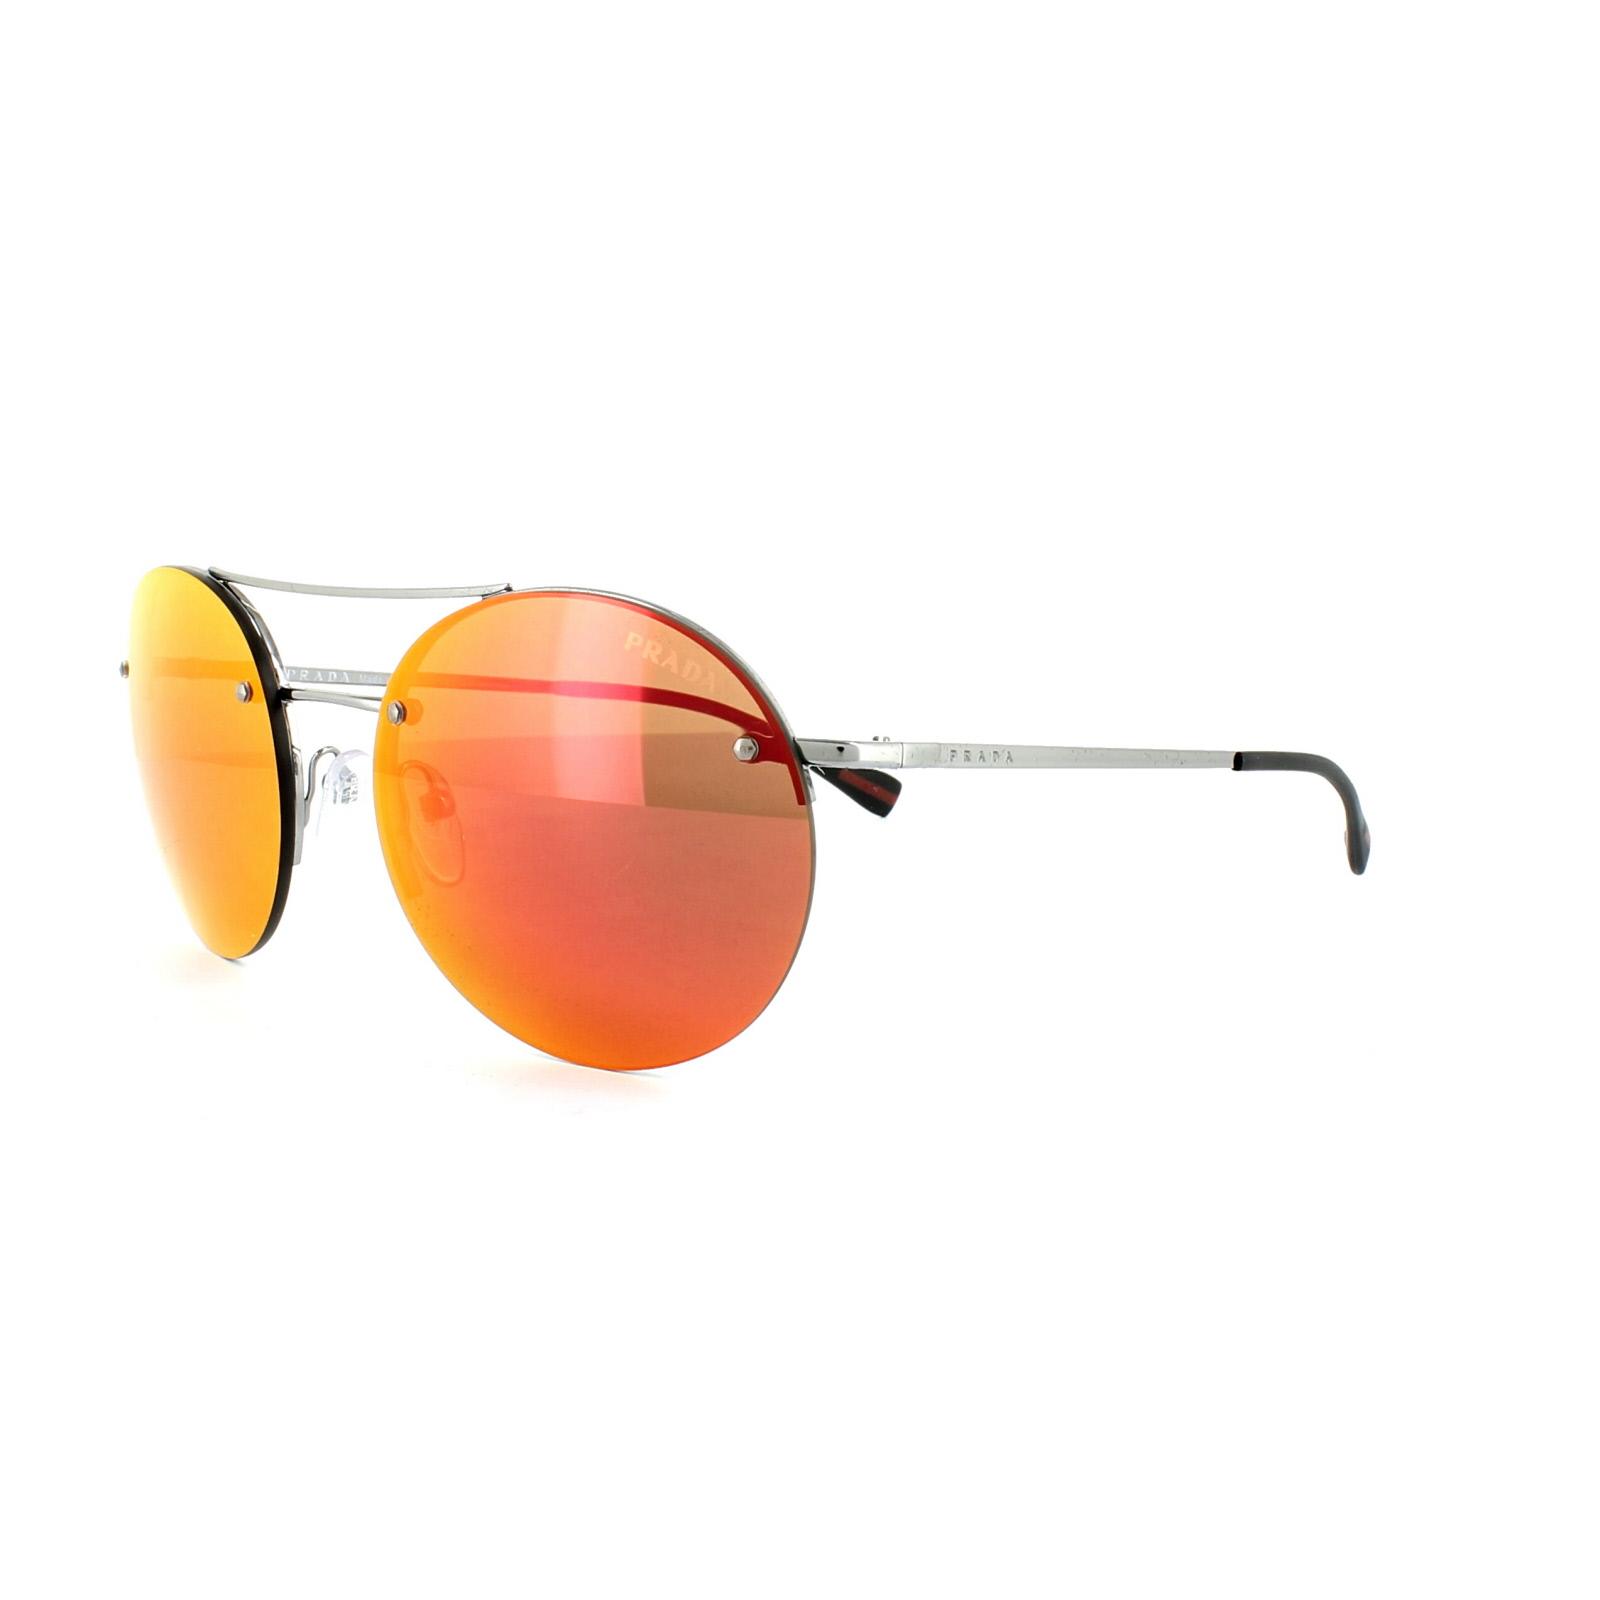 4e9693f311fa Sentinel Prada Sport Sunglasses 54RS 5AV5M0 Gunmetal Grey Orange Mirror